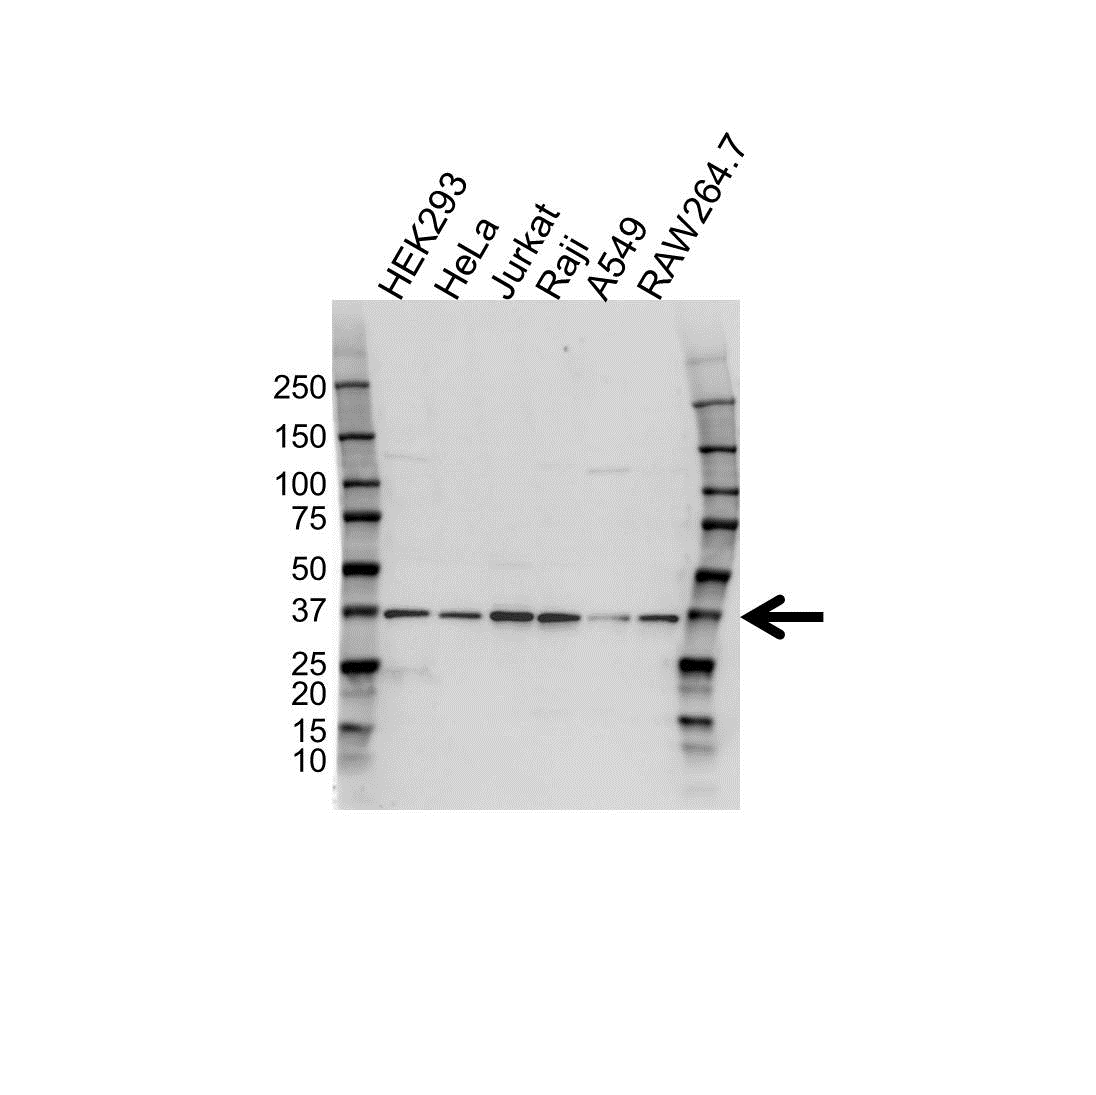 Anti U2AF1 Antibody (PrecisionAb Polyclonal Antibody) gallery image 1